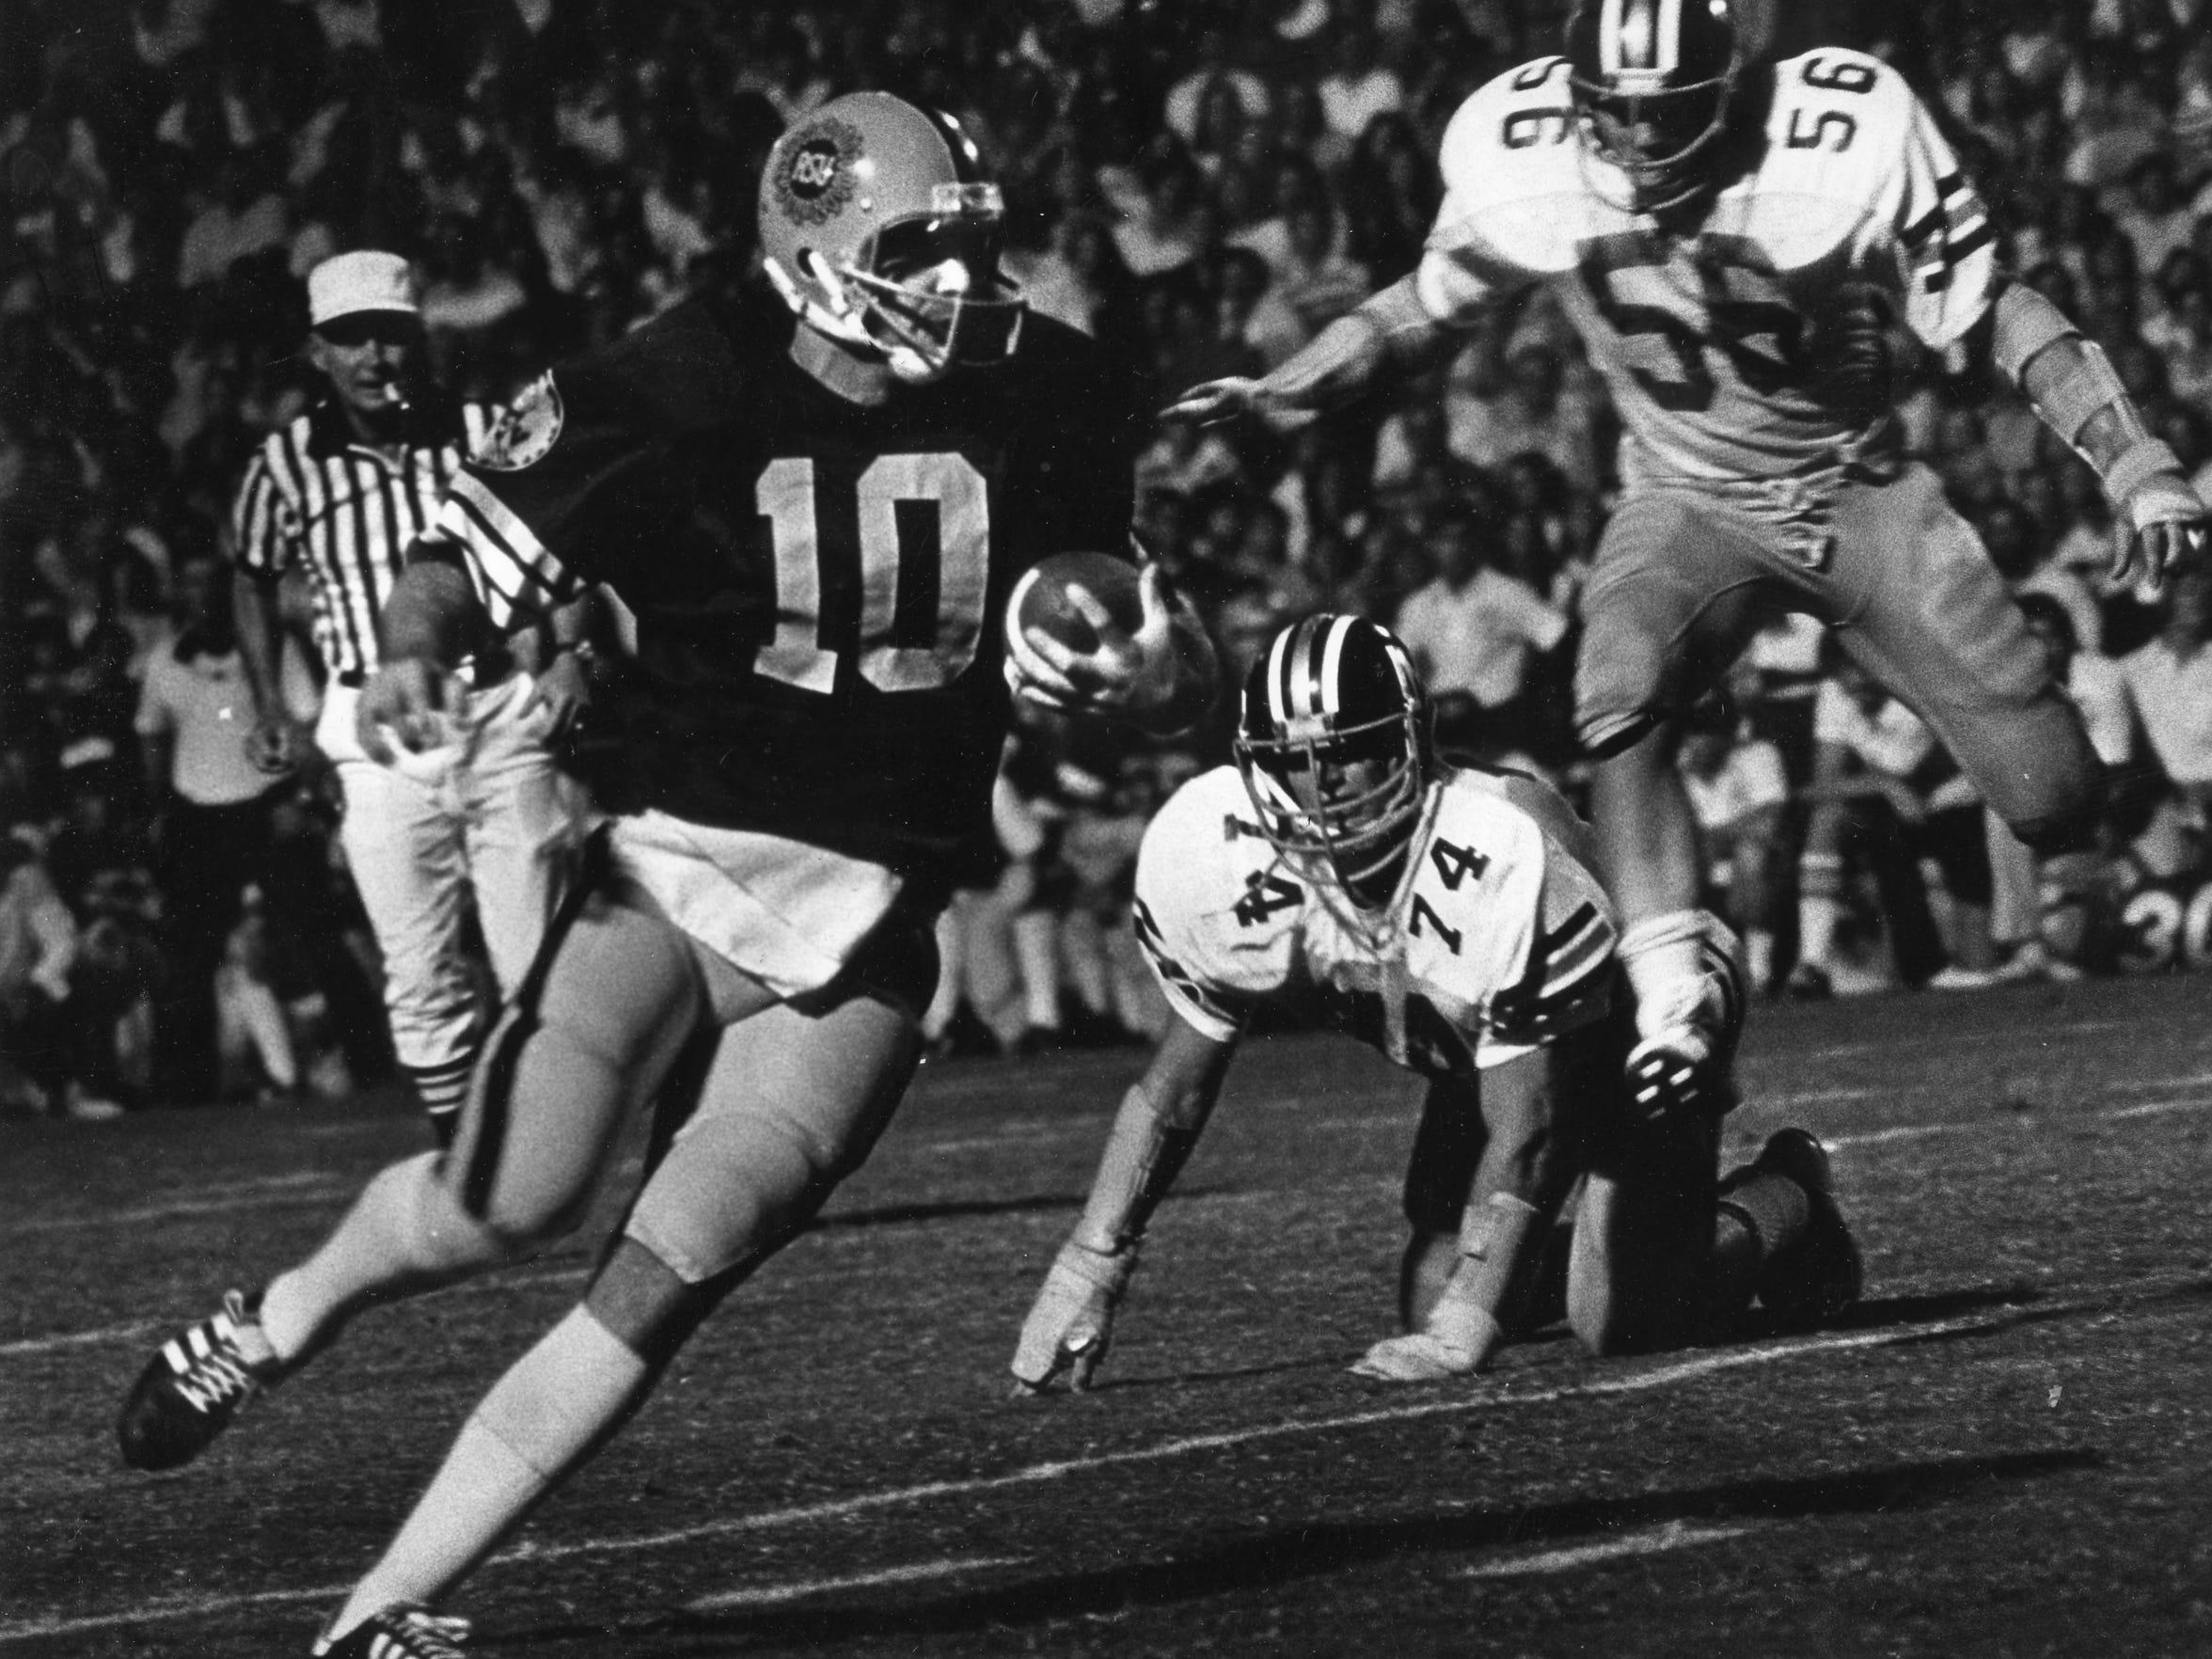 Frank Kush opened a revolving quarterback door between